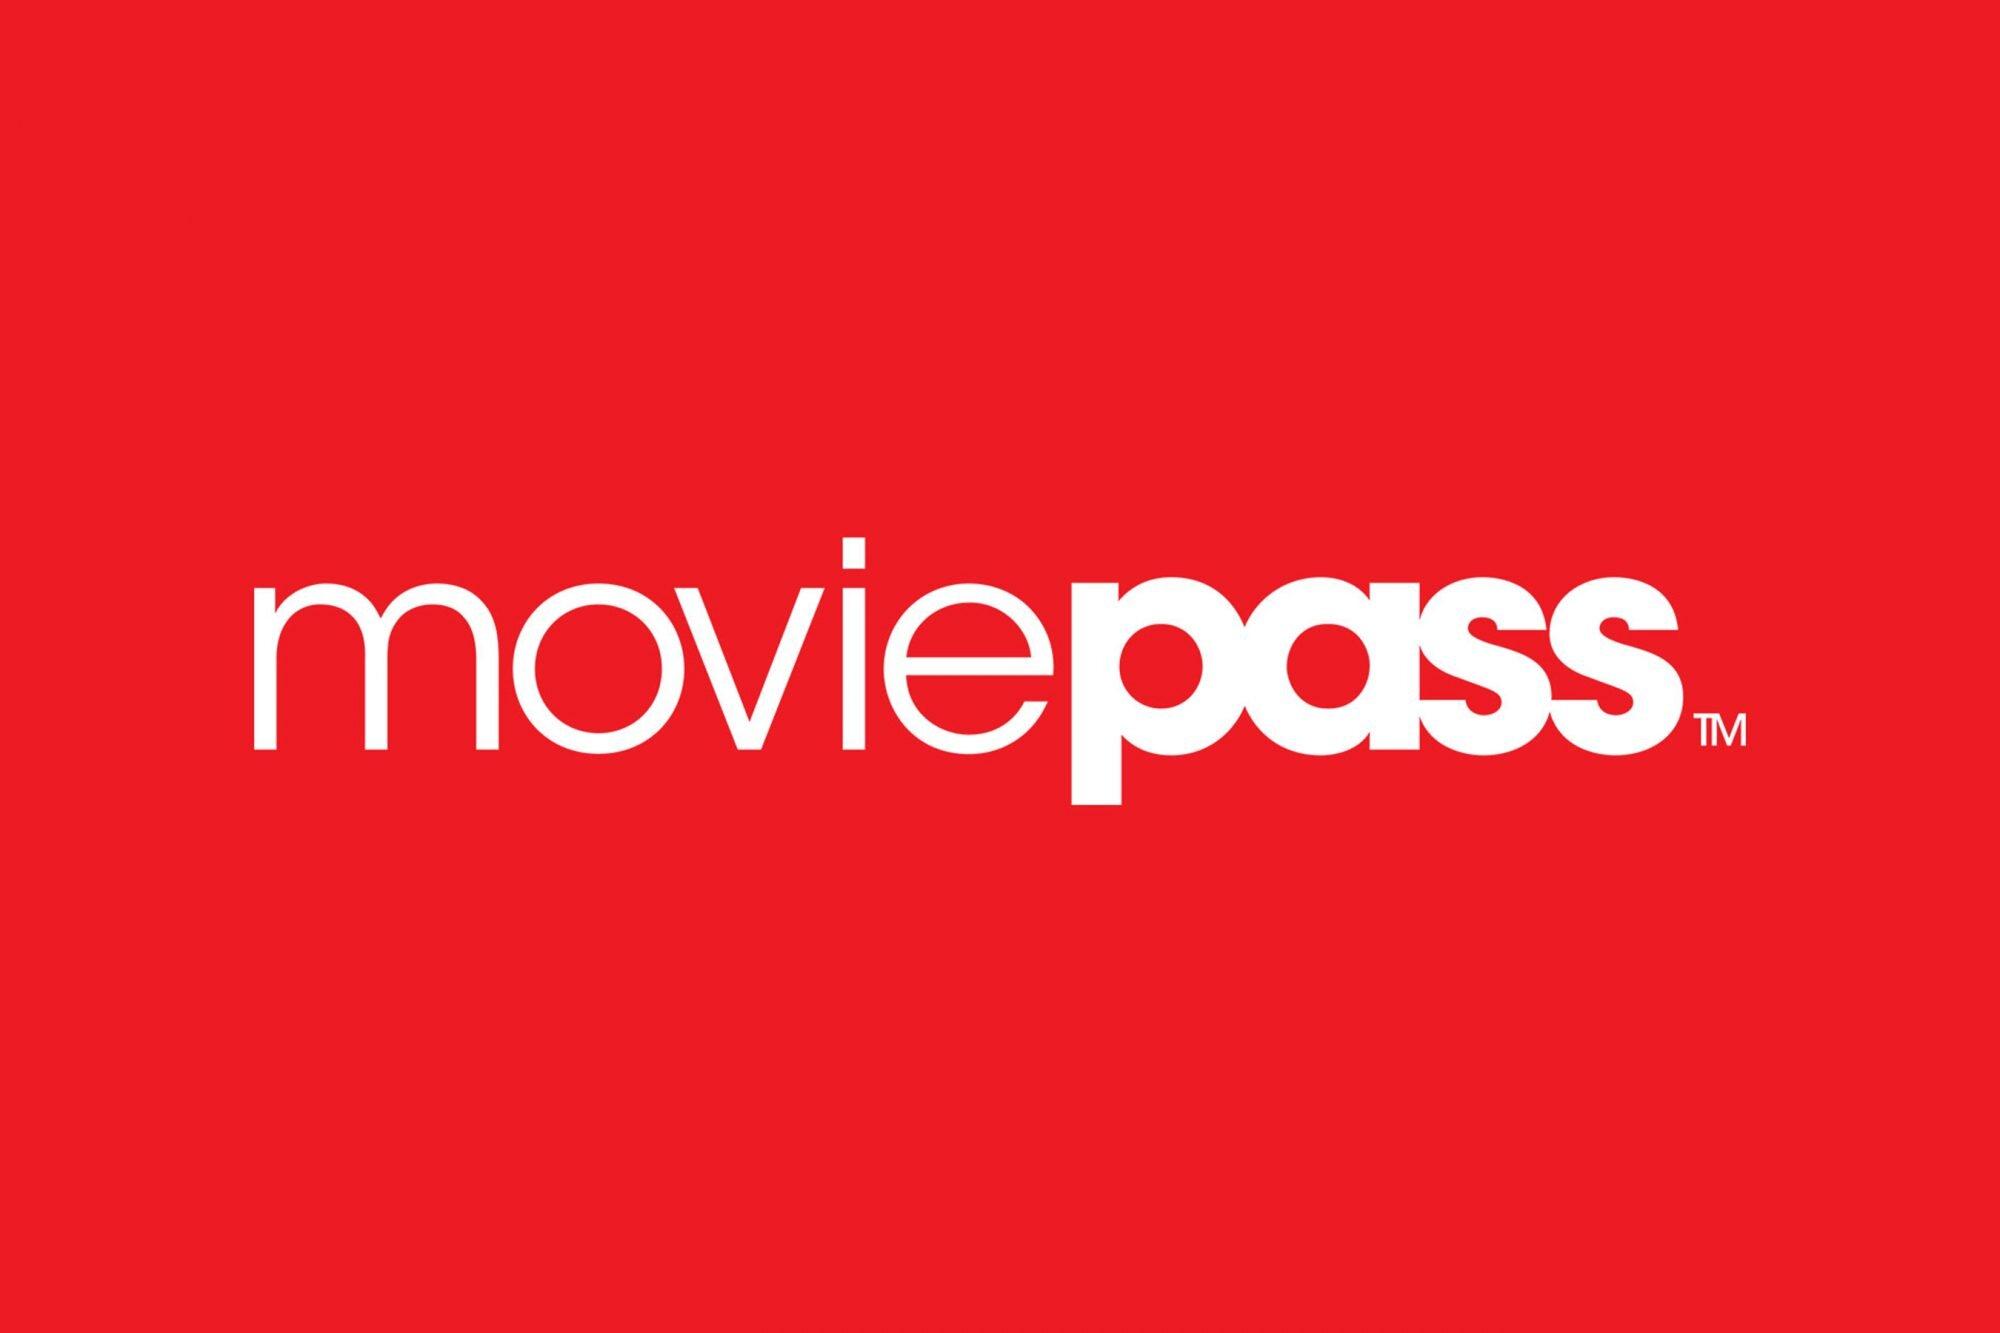 MoviePass dead: Movie subscription service shuts down | EW.com